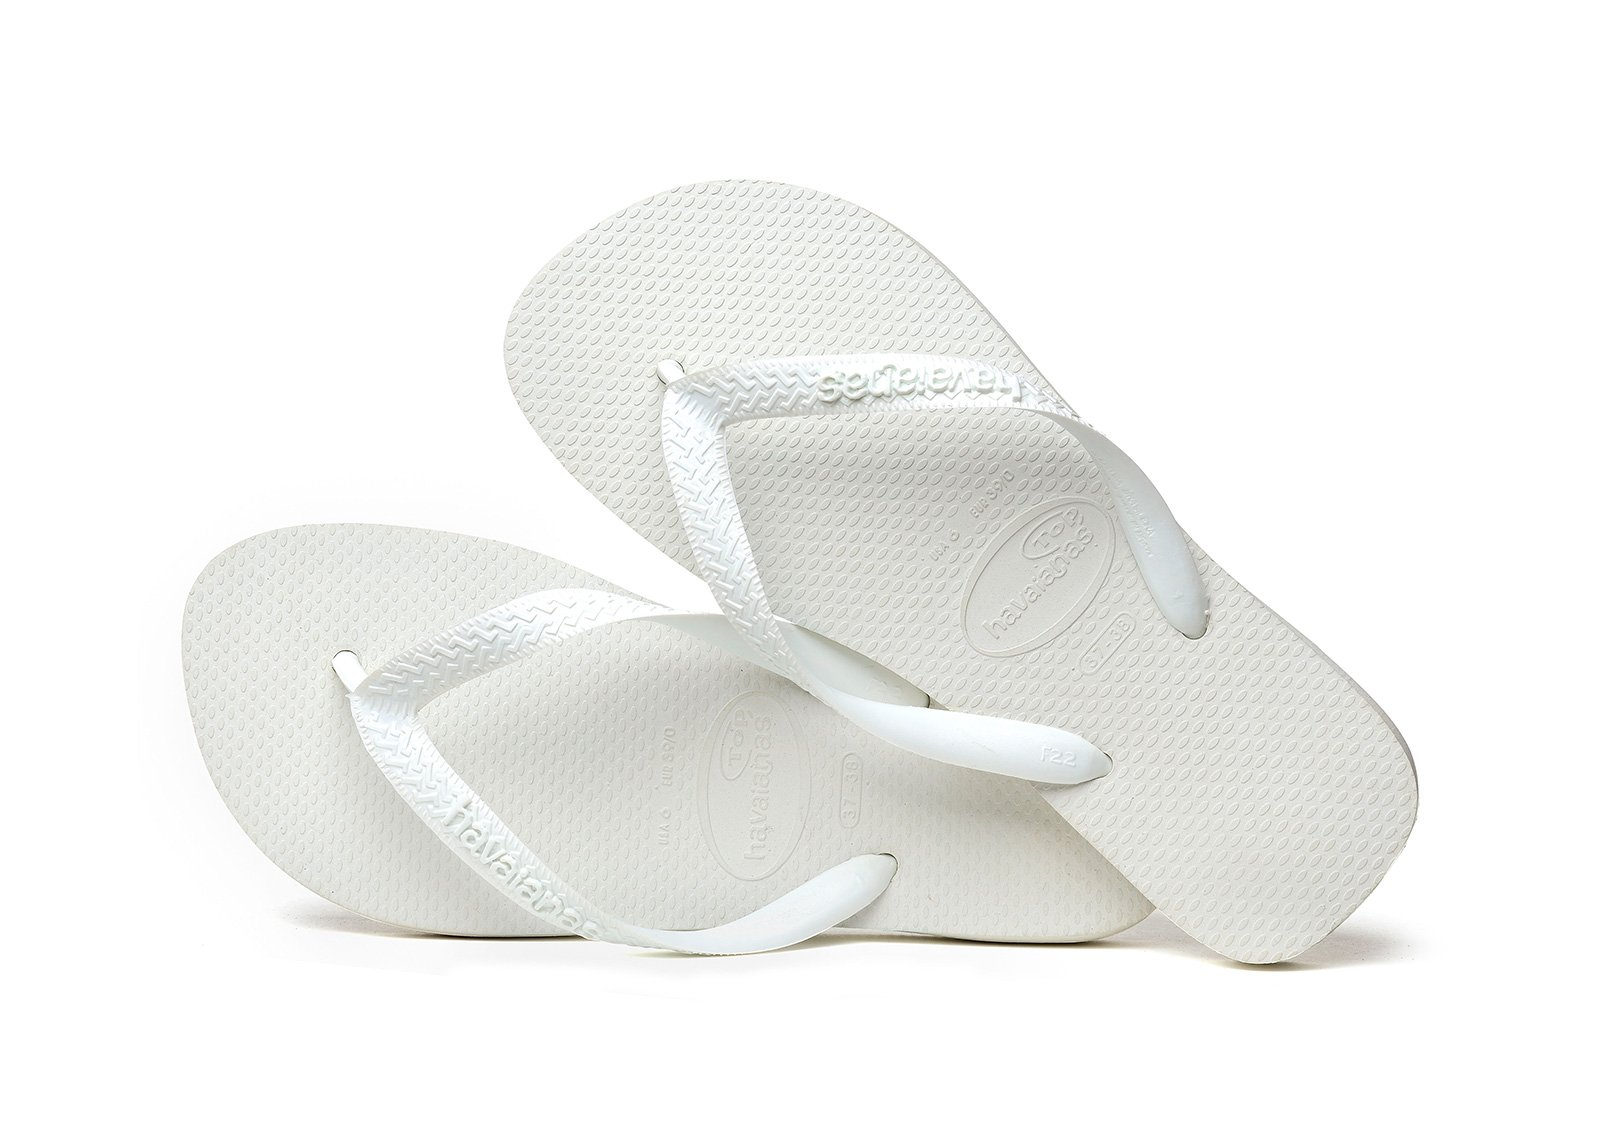 Havaianas Womens Top White Flip Flops